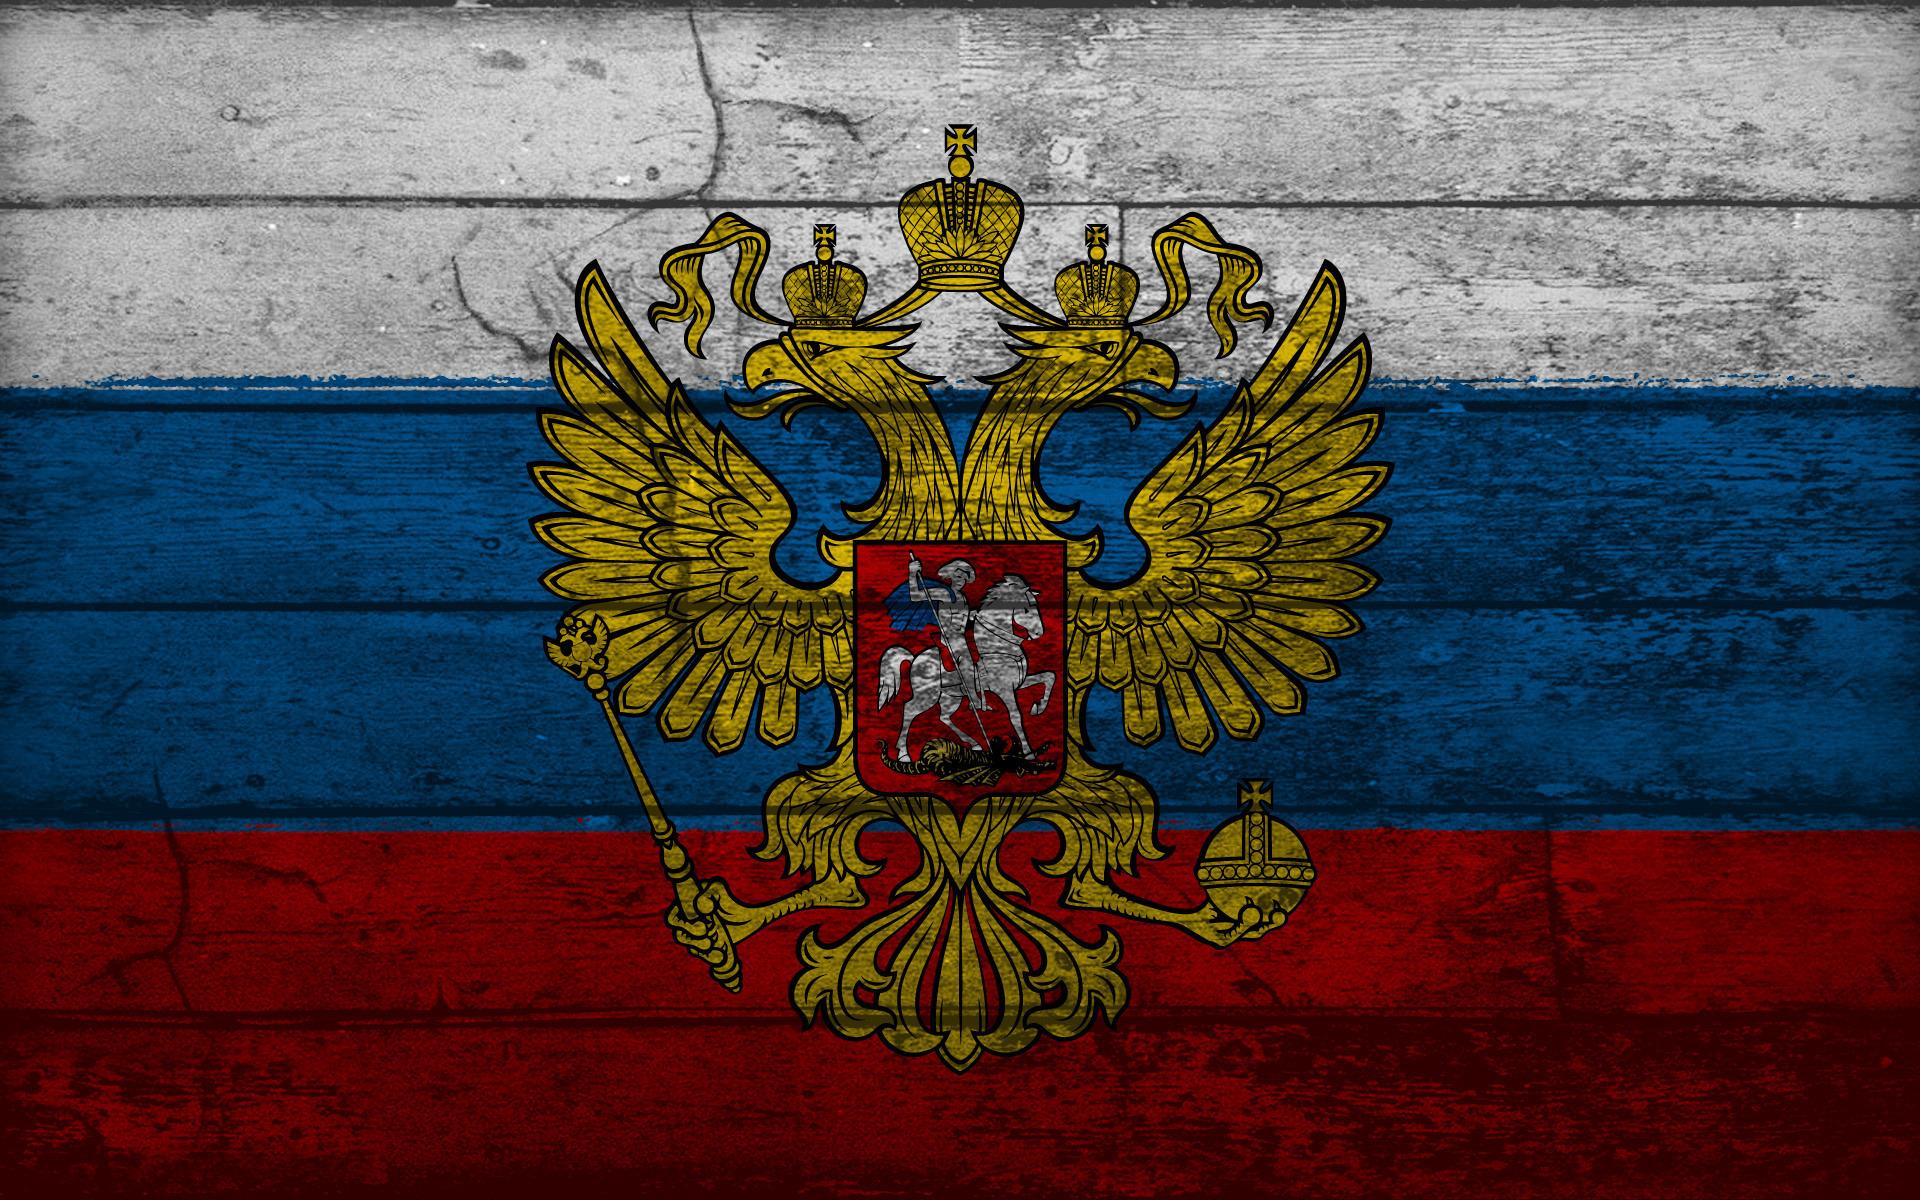 Russland erhöht seinen Goldbestand im Oktober 2015